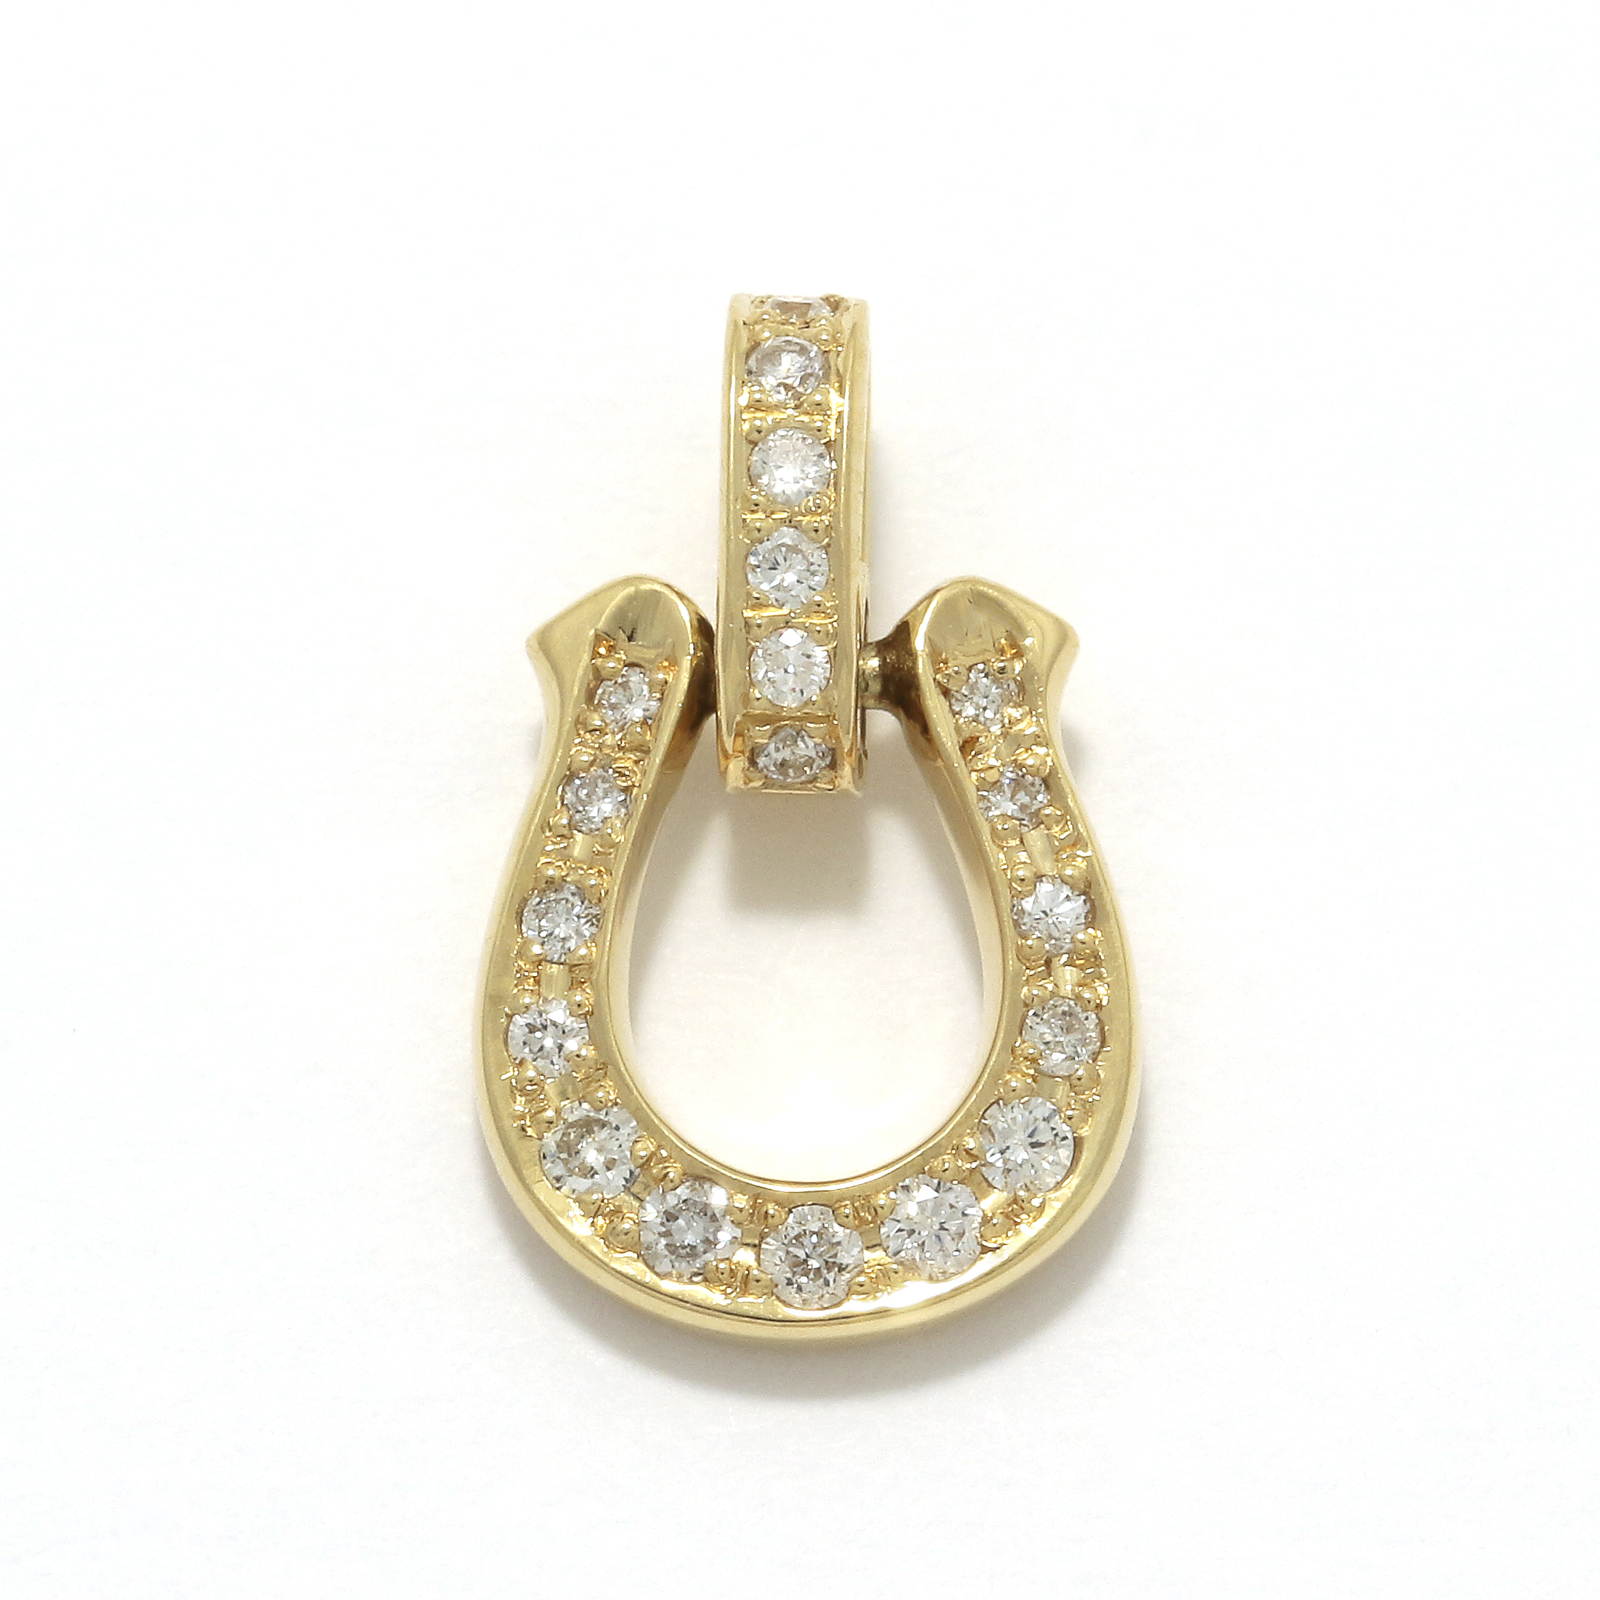 Horseshoe Amulet - K18Yellow Gold w/Diamond